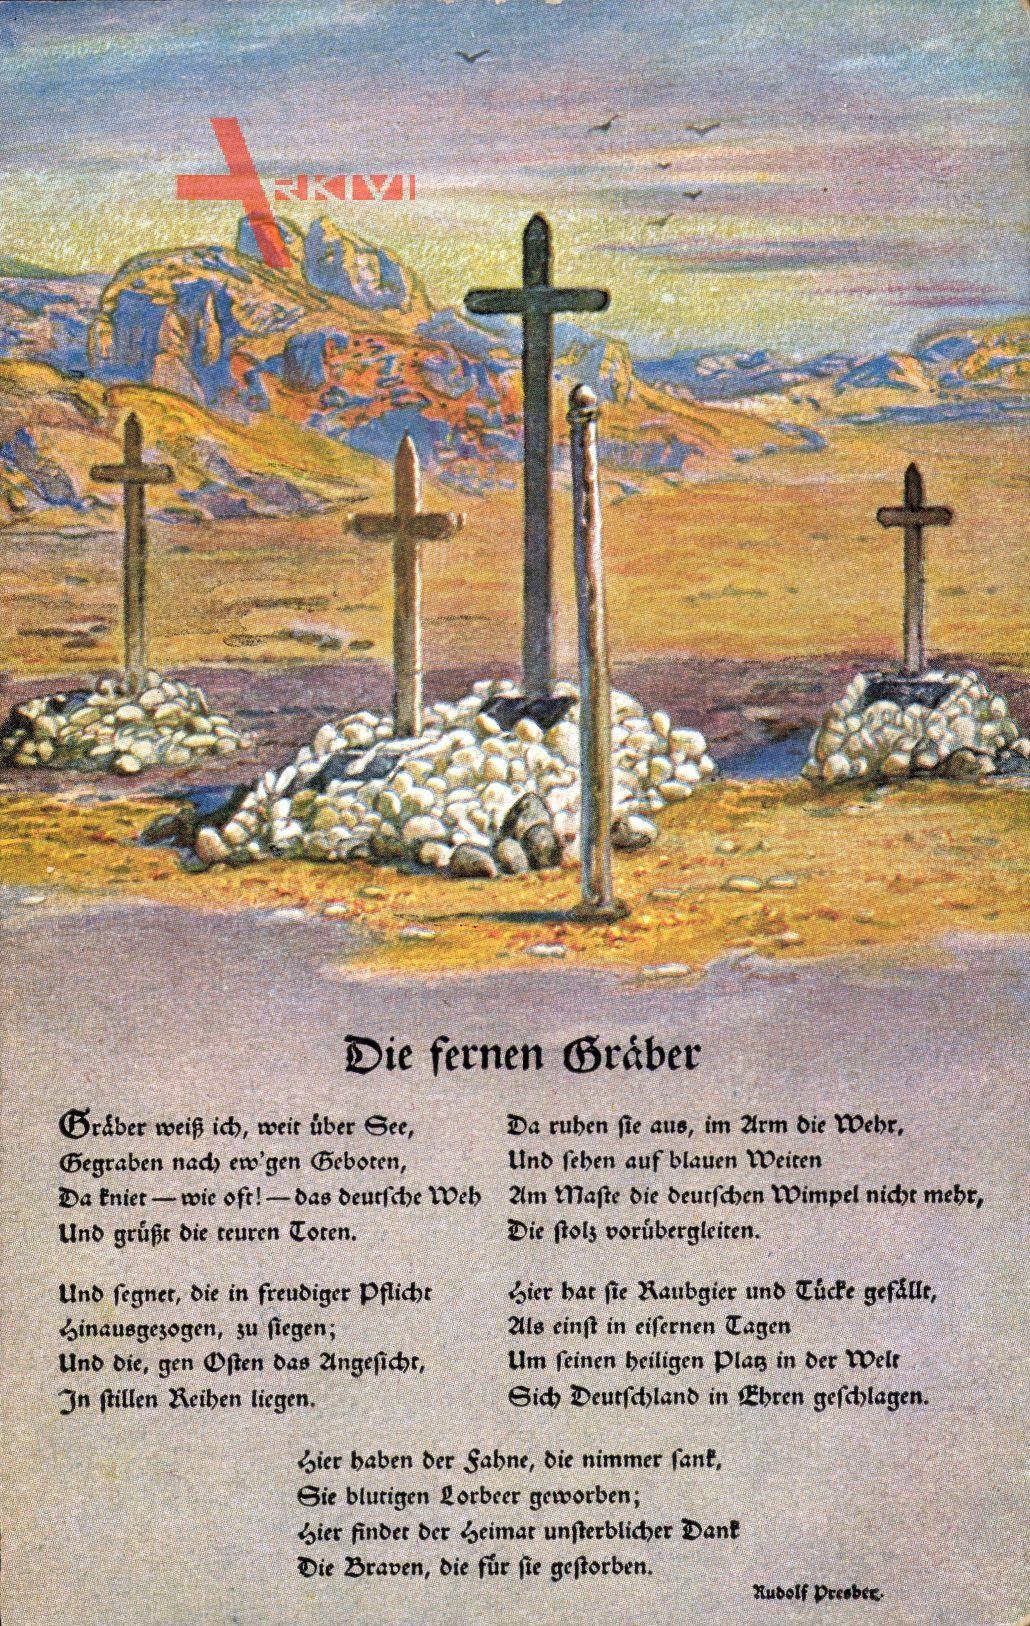 Die Fernen Gräber, Erster Weltkrieg, Soldatengräber, Südwestafrika